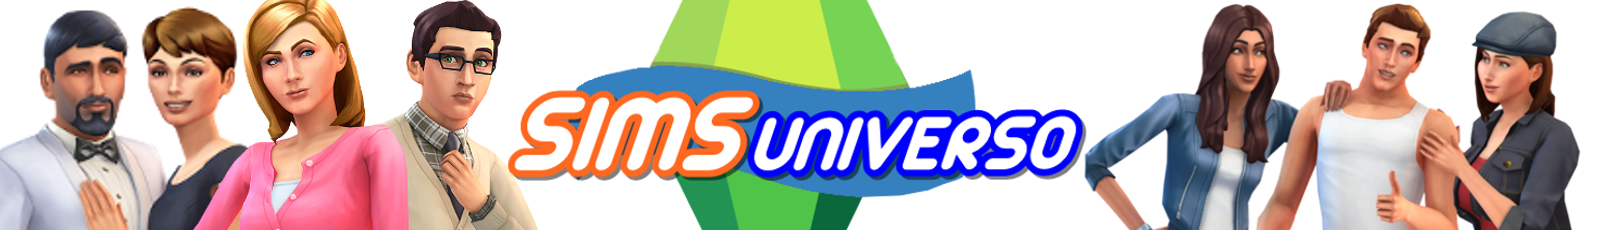 [Tus Cosas] Se viene la web de Sims Universo? BVRLaa9CEAA84Tr